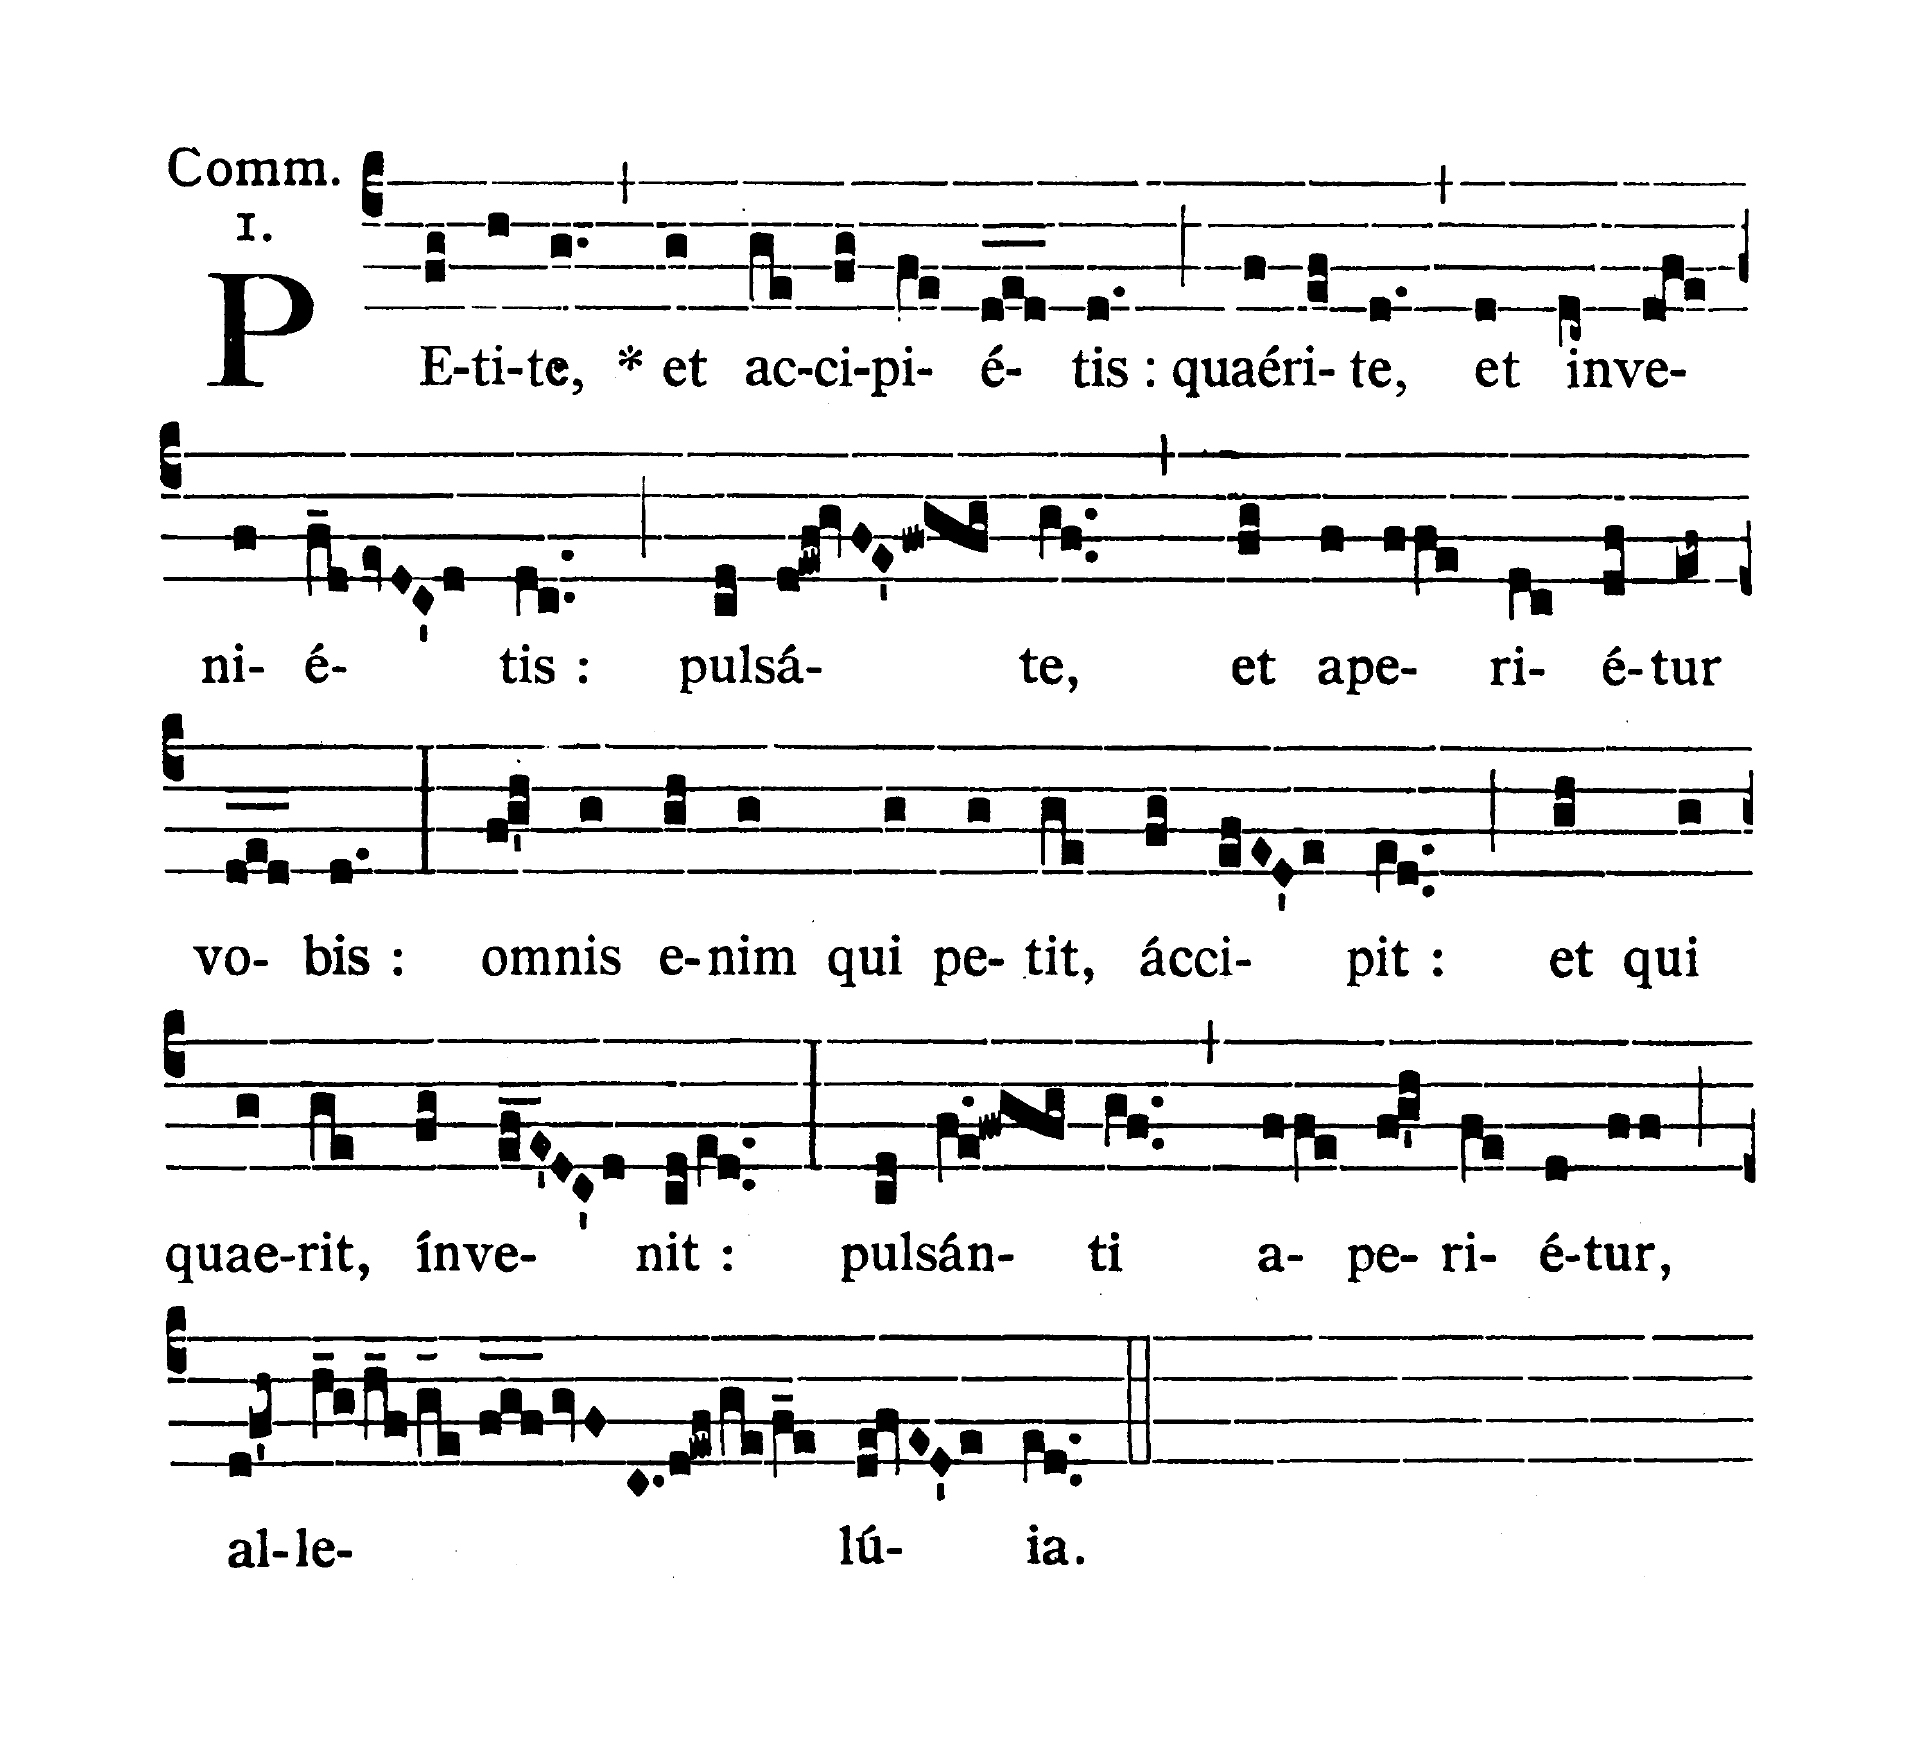 In Litaniis Majoribus et in Minoribus Tempore Paschale (Litanie większe i mniejsze w okresie Wielkanocnym) - Communio (Petite et accipietis)